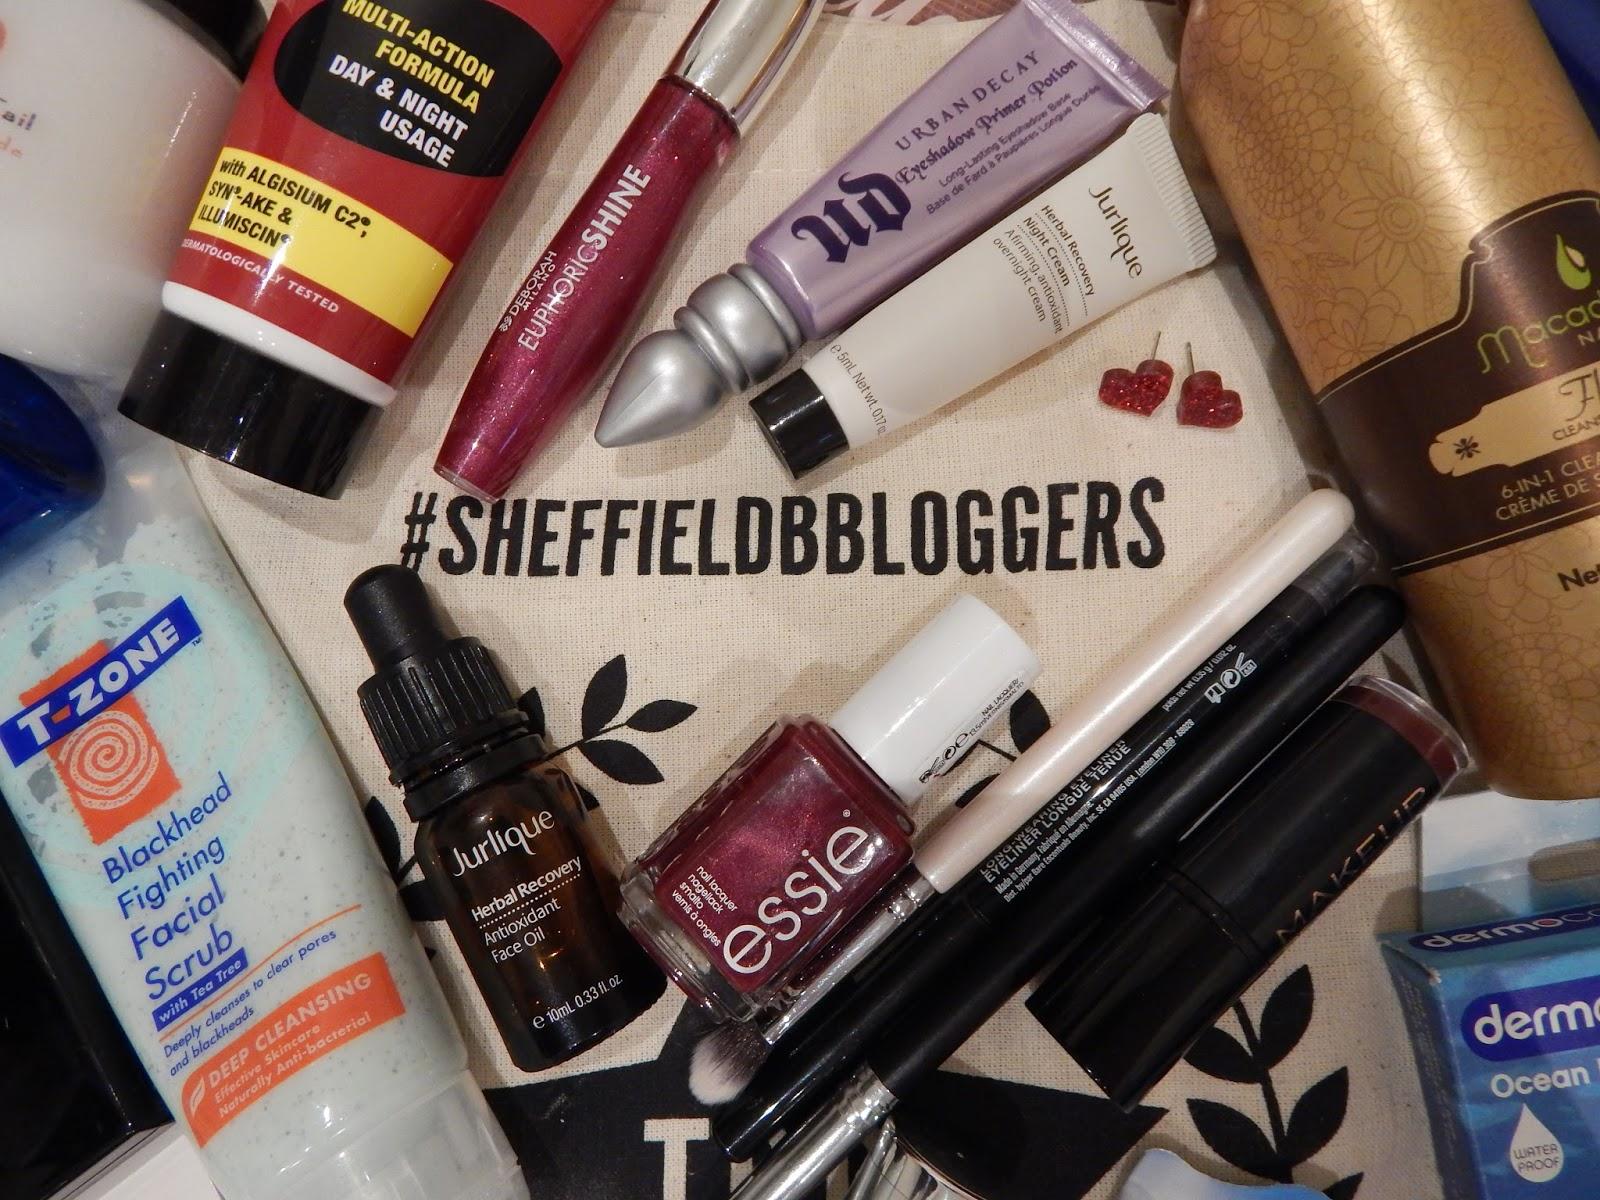 #SheffieldBBloggers Goodie Bag & Raffle Prizes, Sheffield bloggers